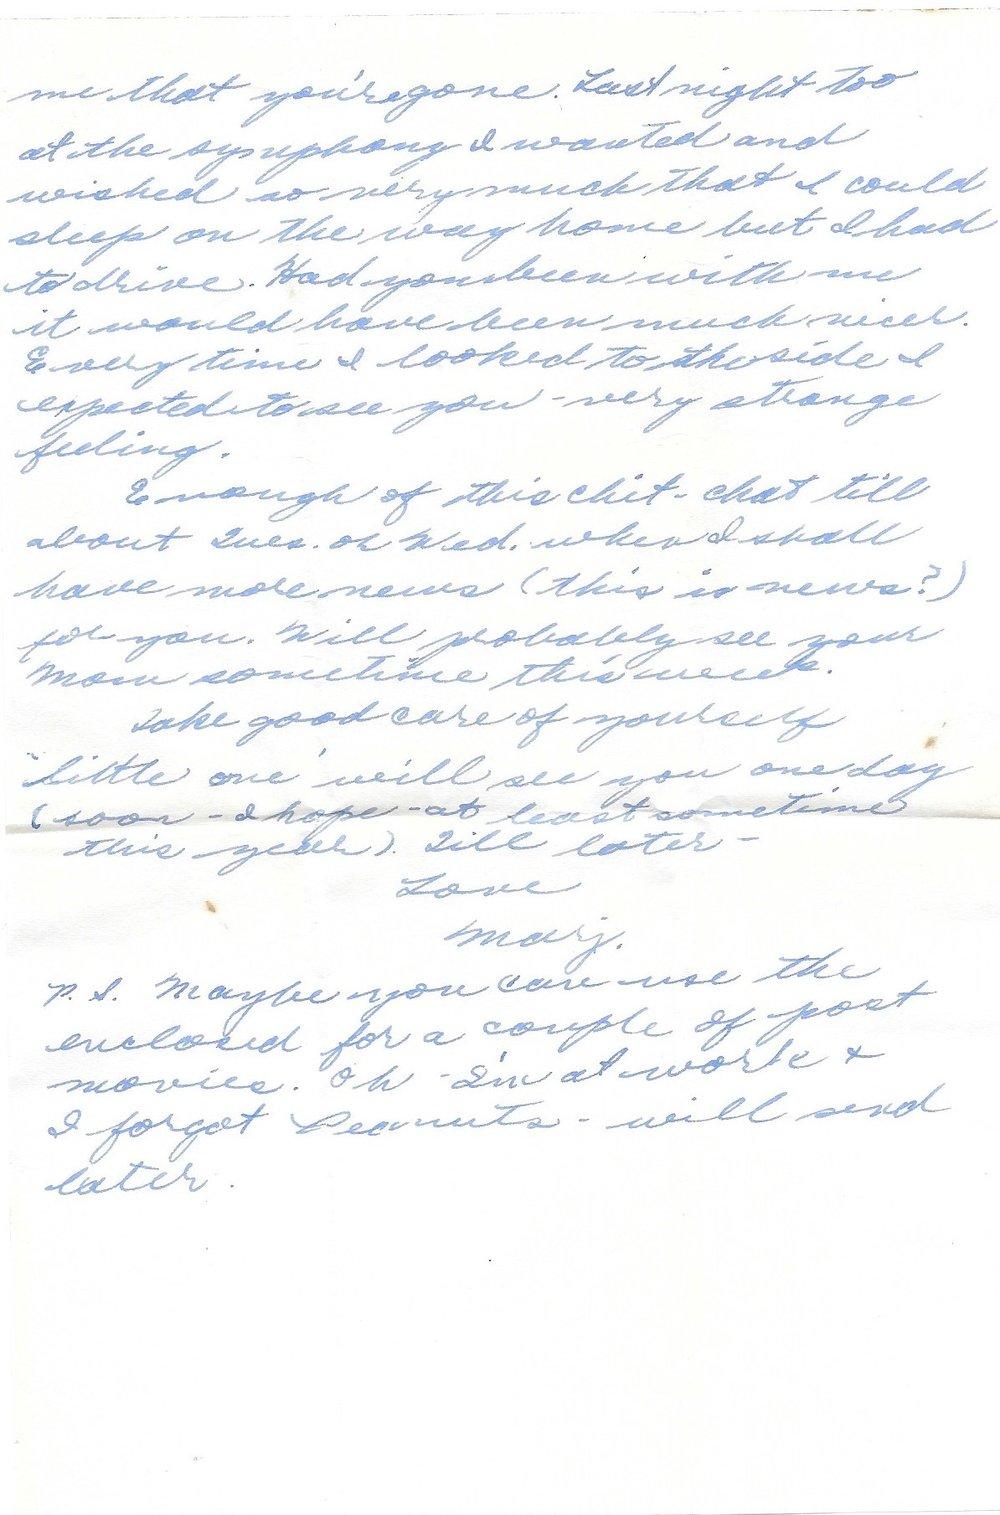 14. Jan. 25, 1953 (Oma)_Page_3 (Rescan).jpeg